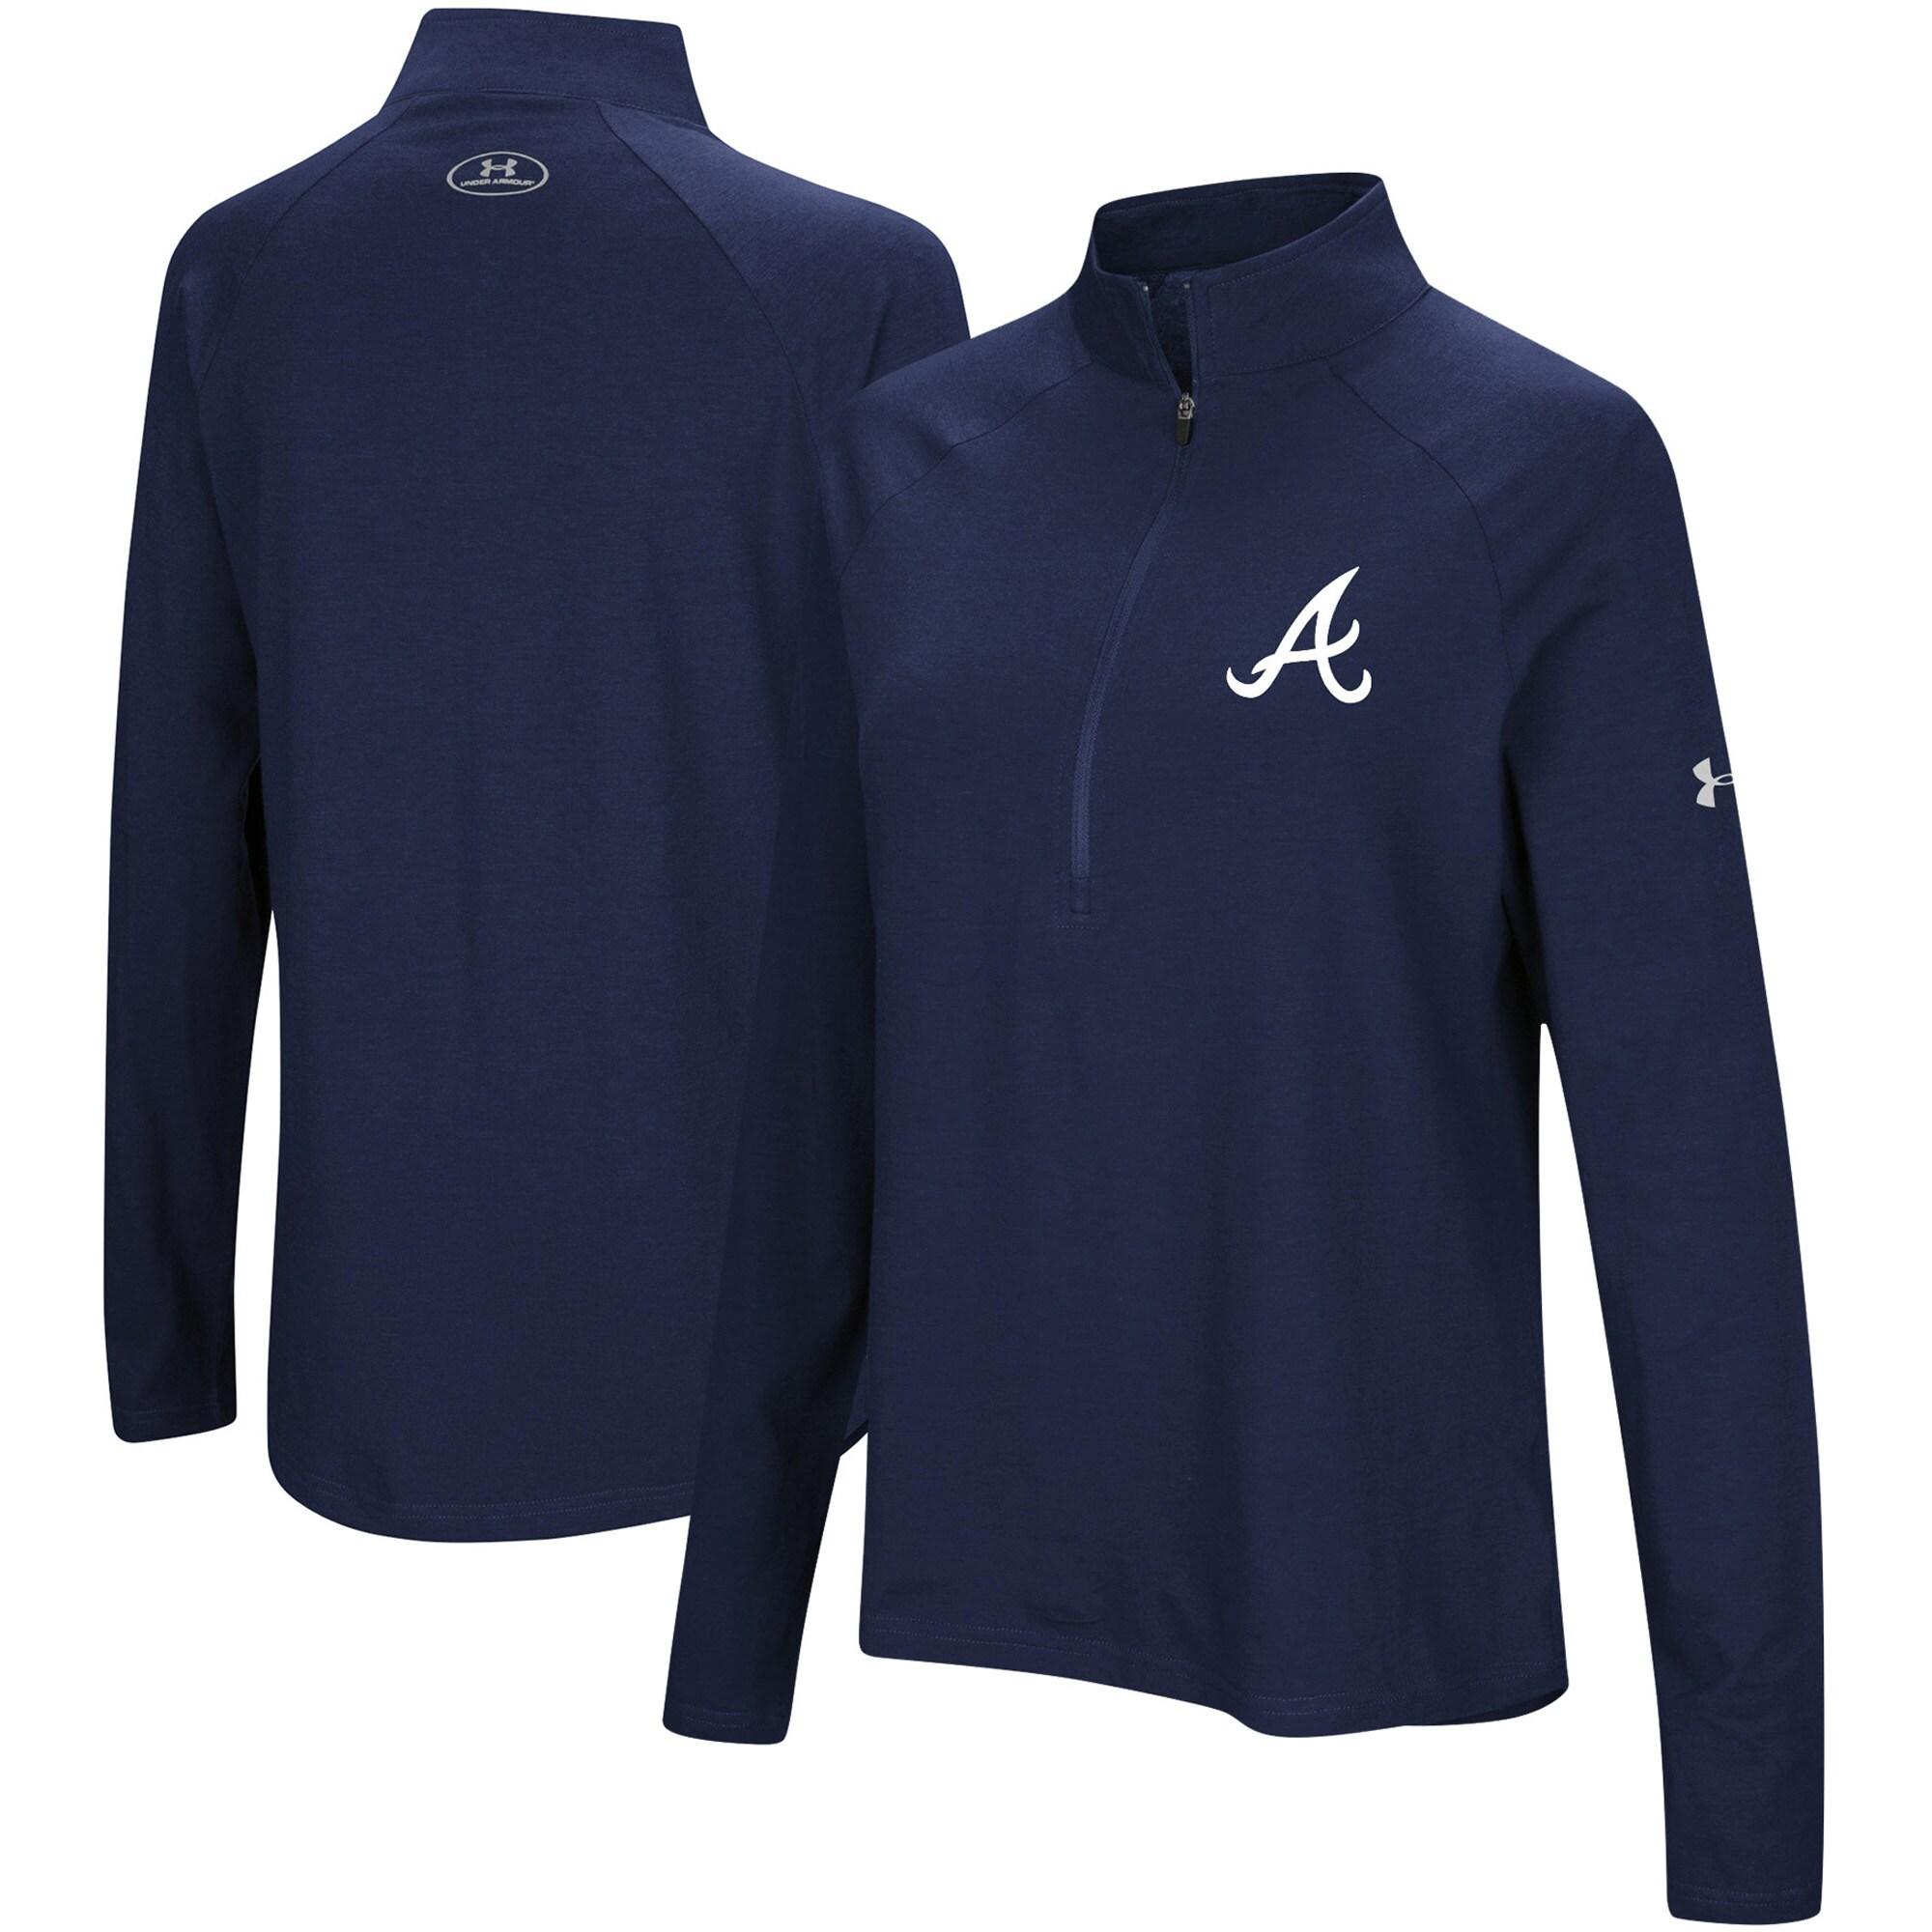 Atlanta Braves Under Armour Women's Passion Performance Tri-Blend Raglan Half-Zip Pullover Jacket - Navy